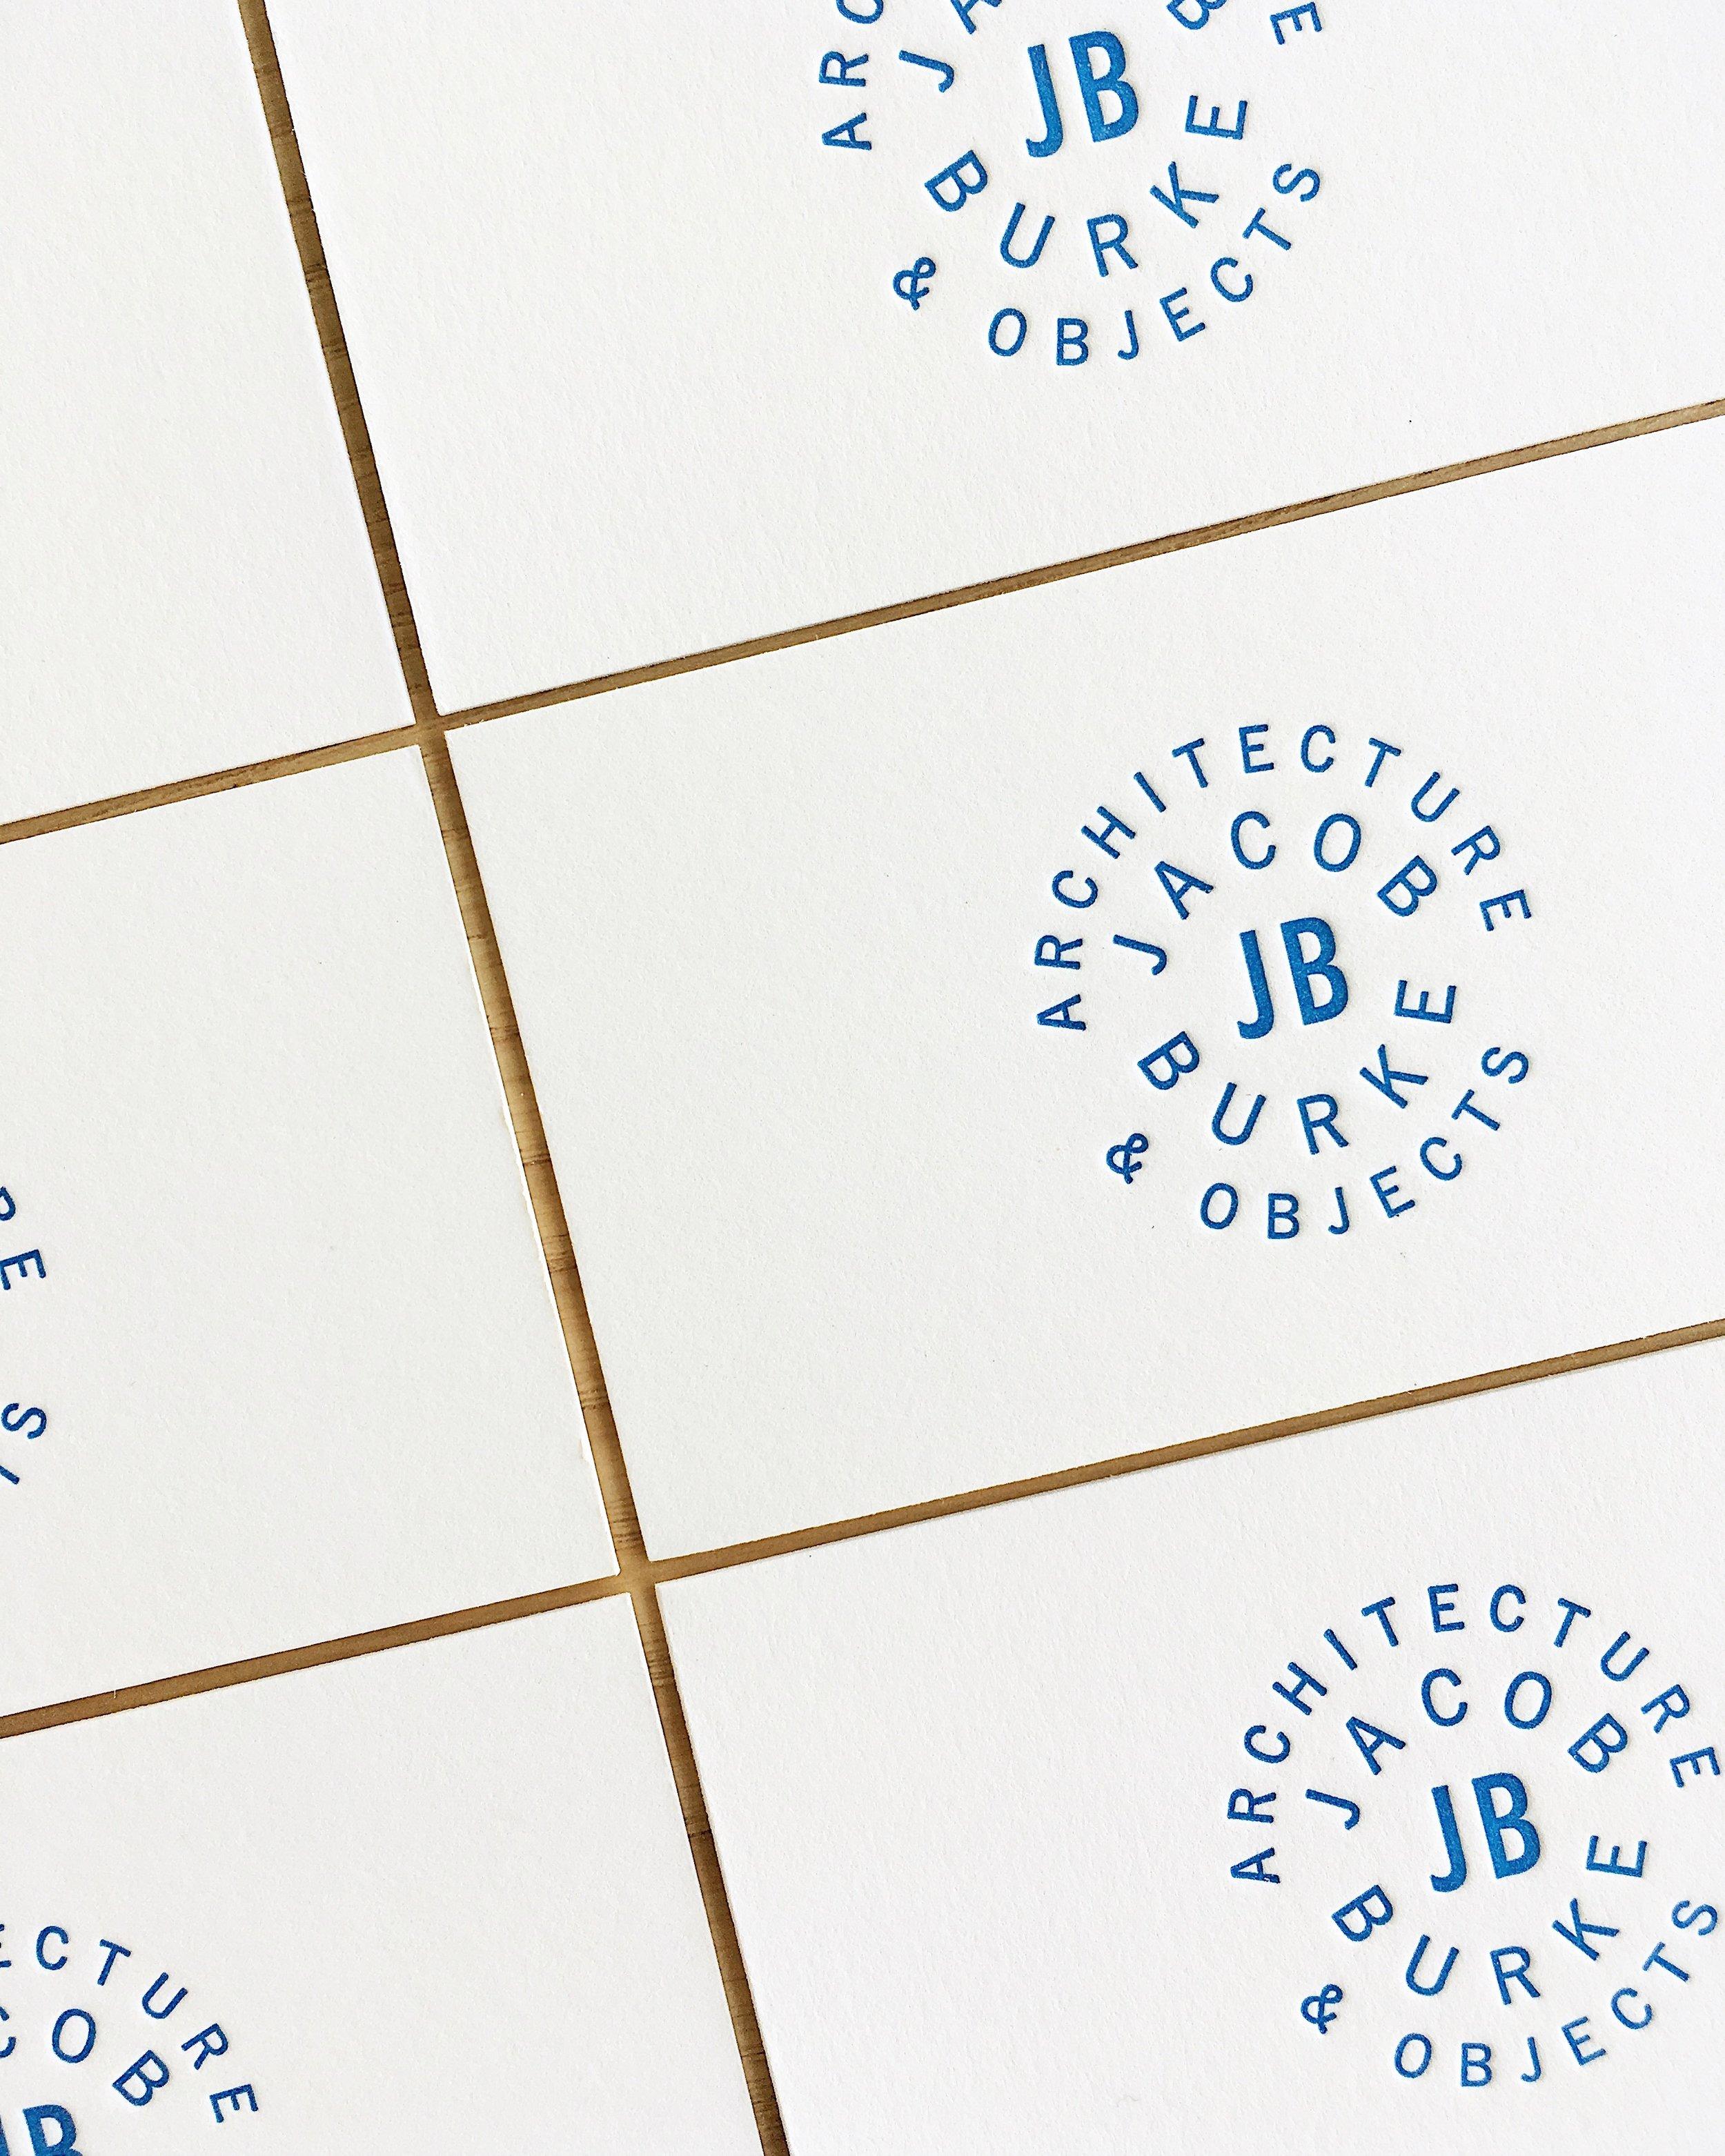 Design by Good South / Jacob Burke - Identity & Letterpress Cards